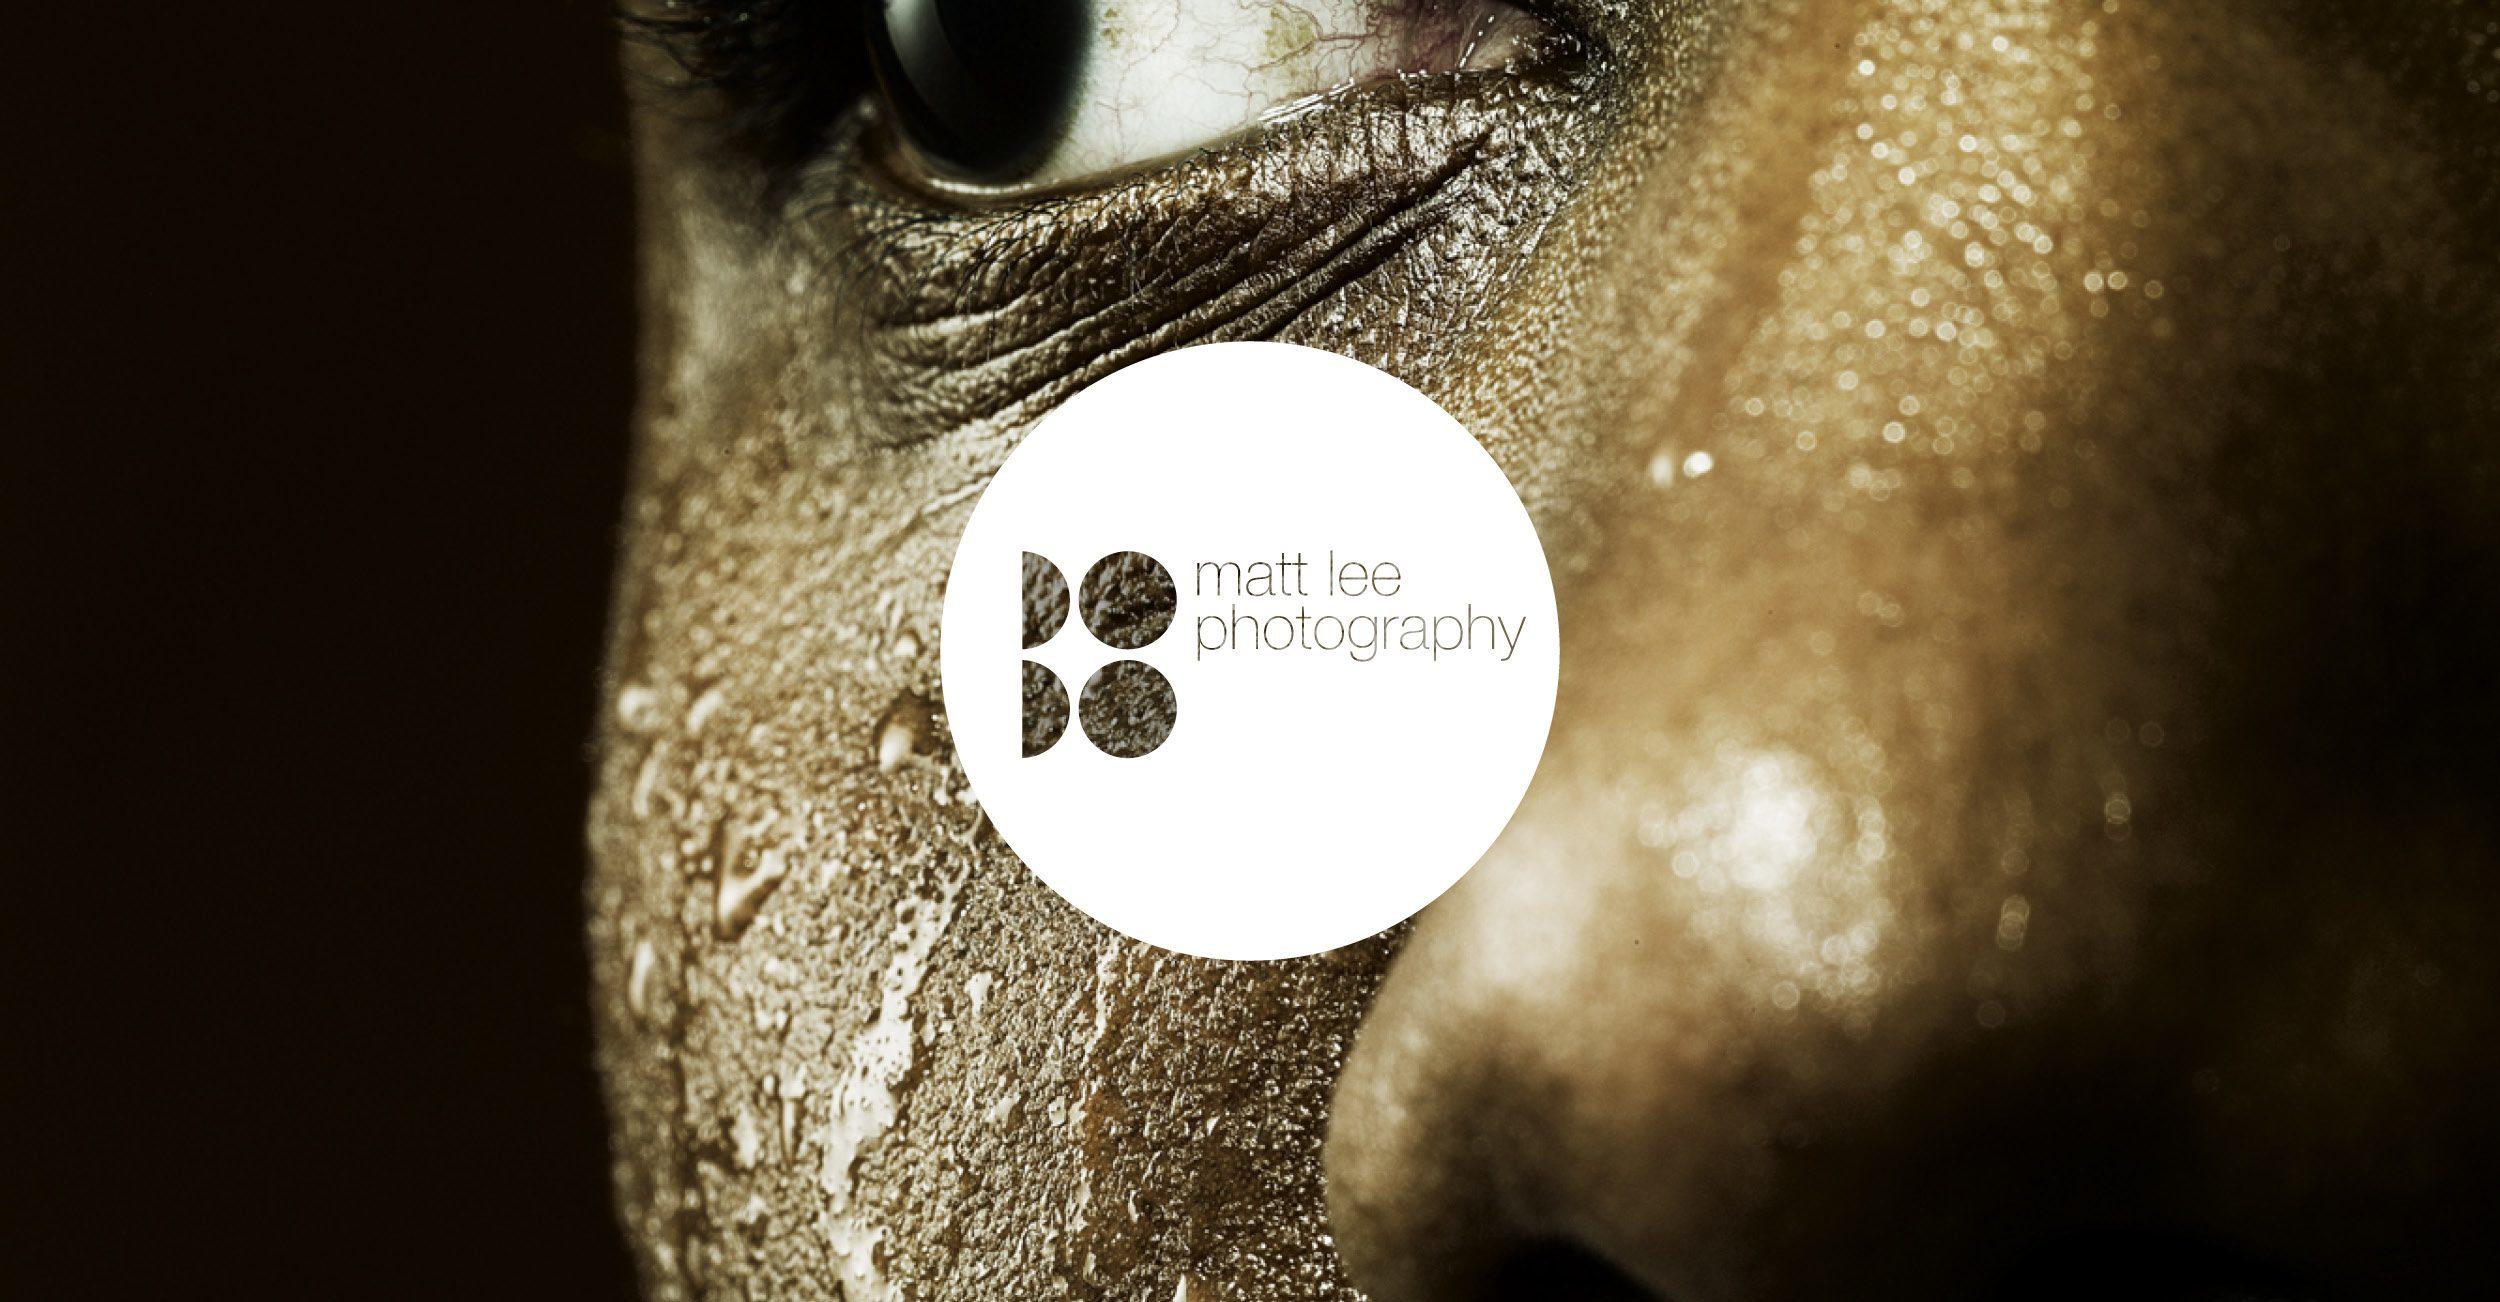 Matt Lee Photography - Brand & Identity Creation